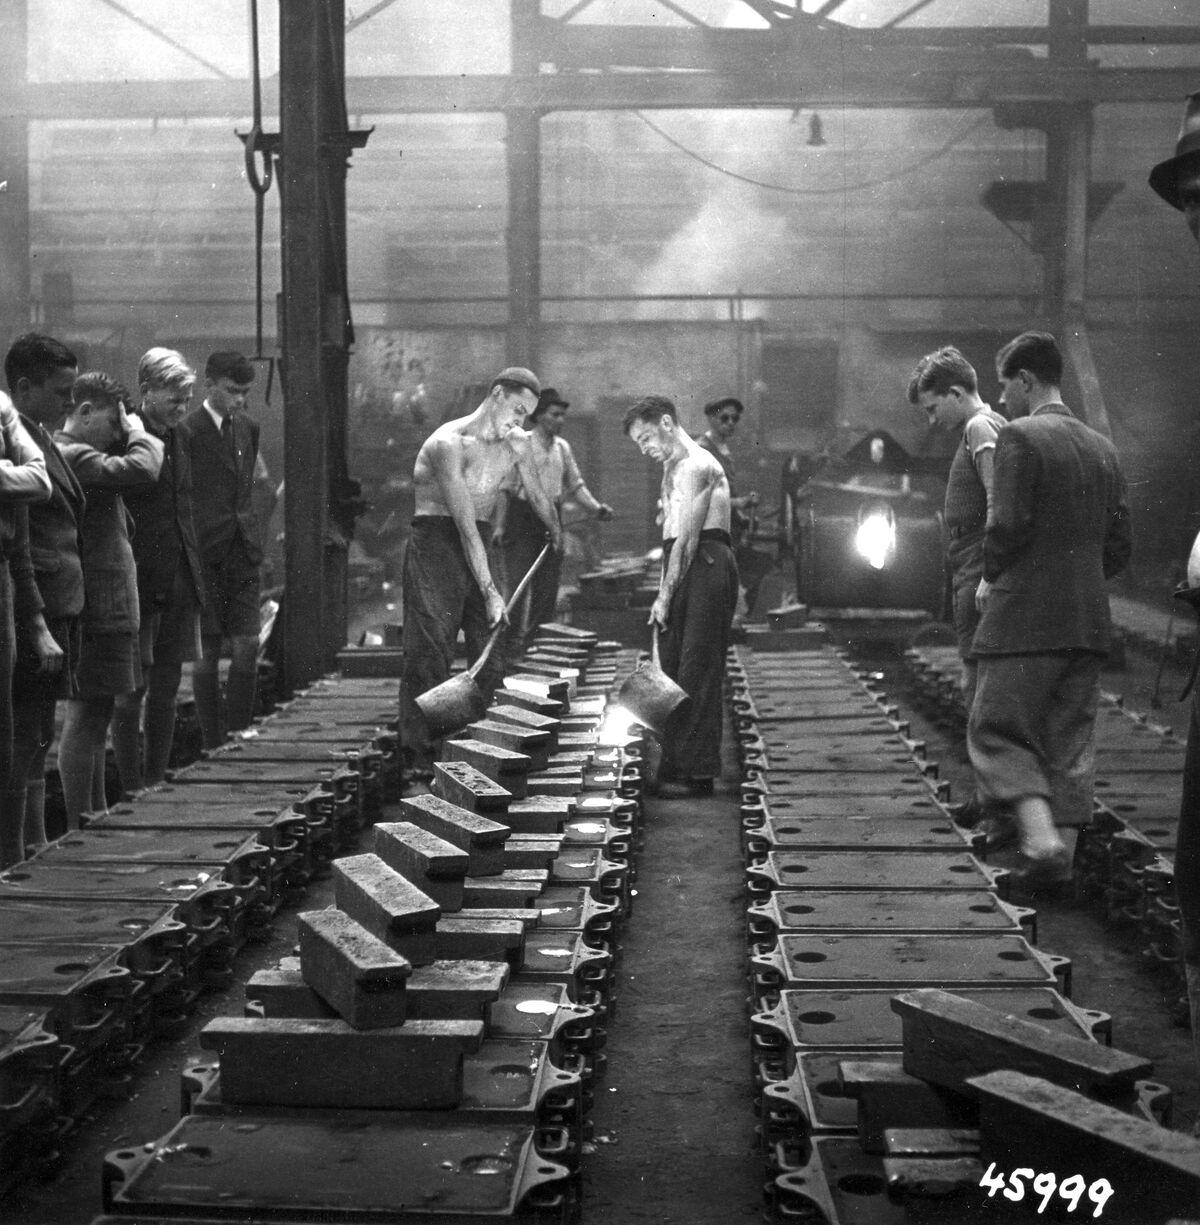 GFA 12/45999: Reportage casting process in malleable casting